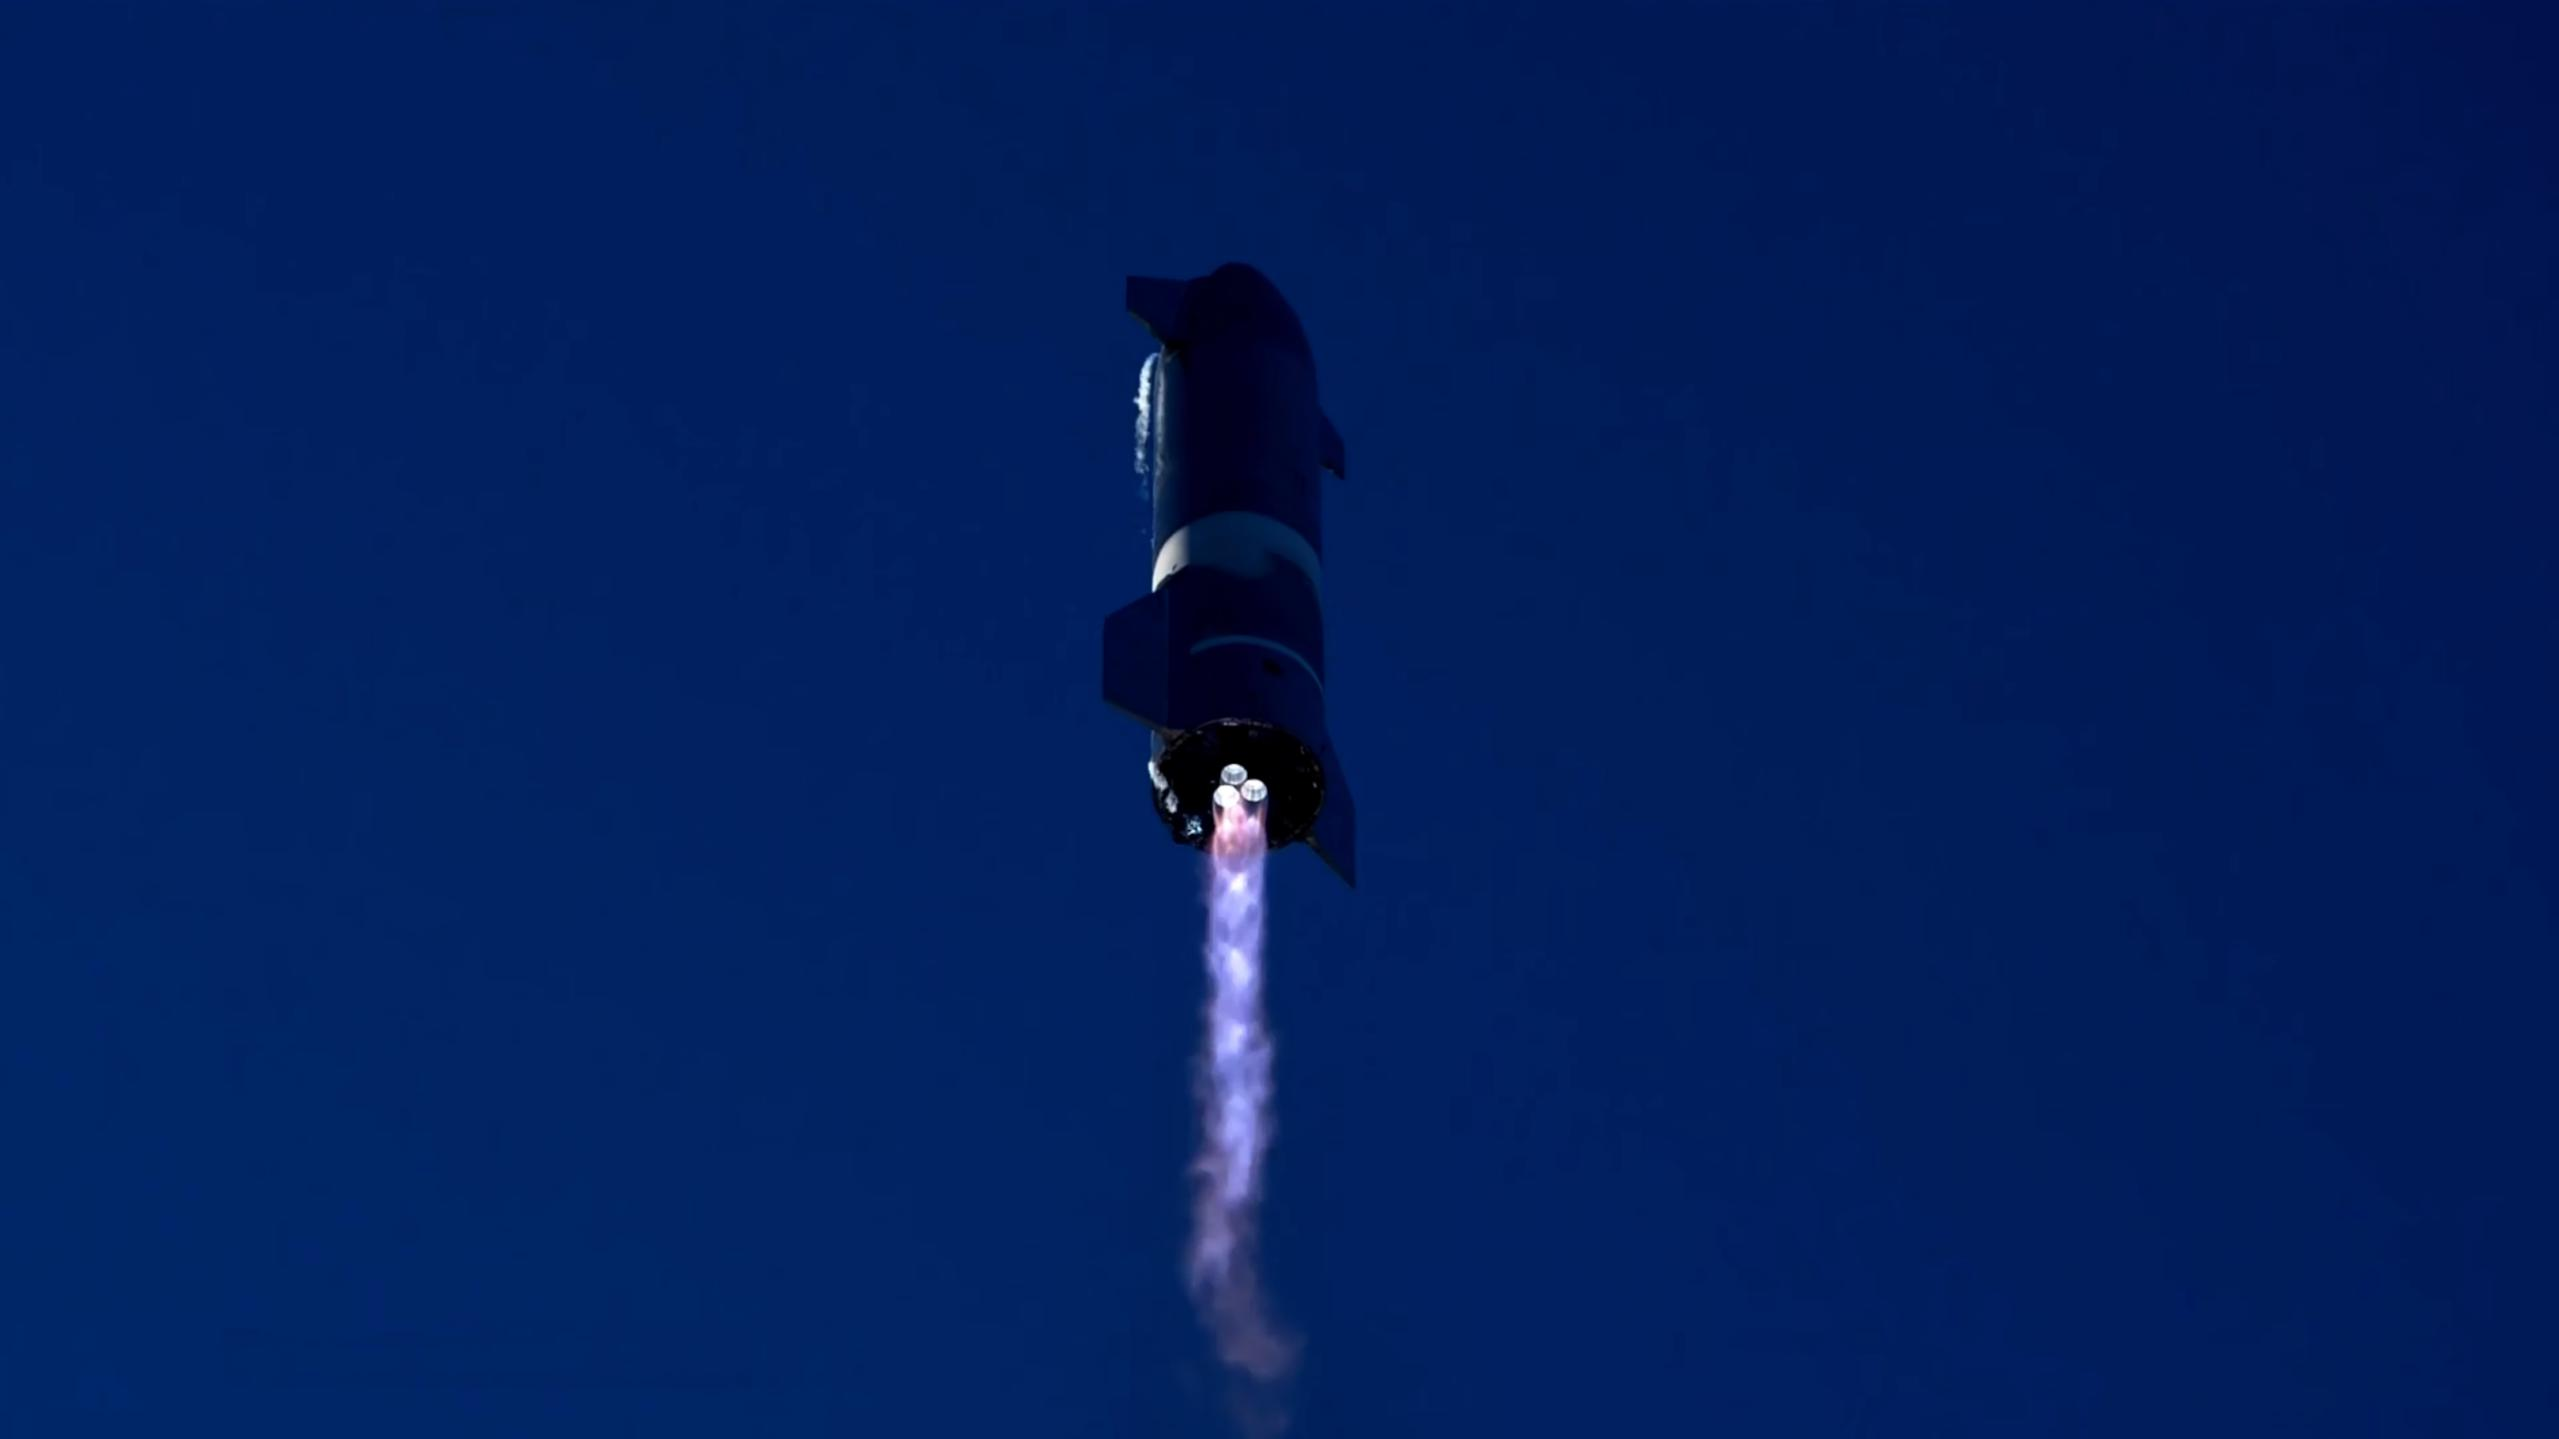 Starship SN8 launch recap 120920 (SpaceX) 3 (c)